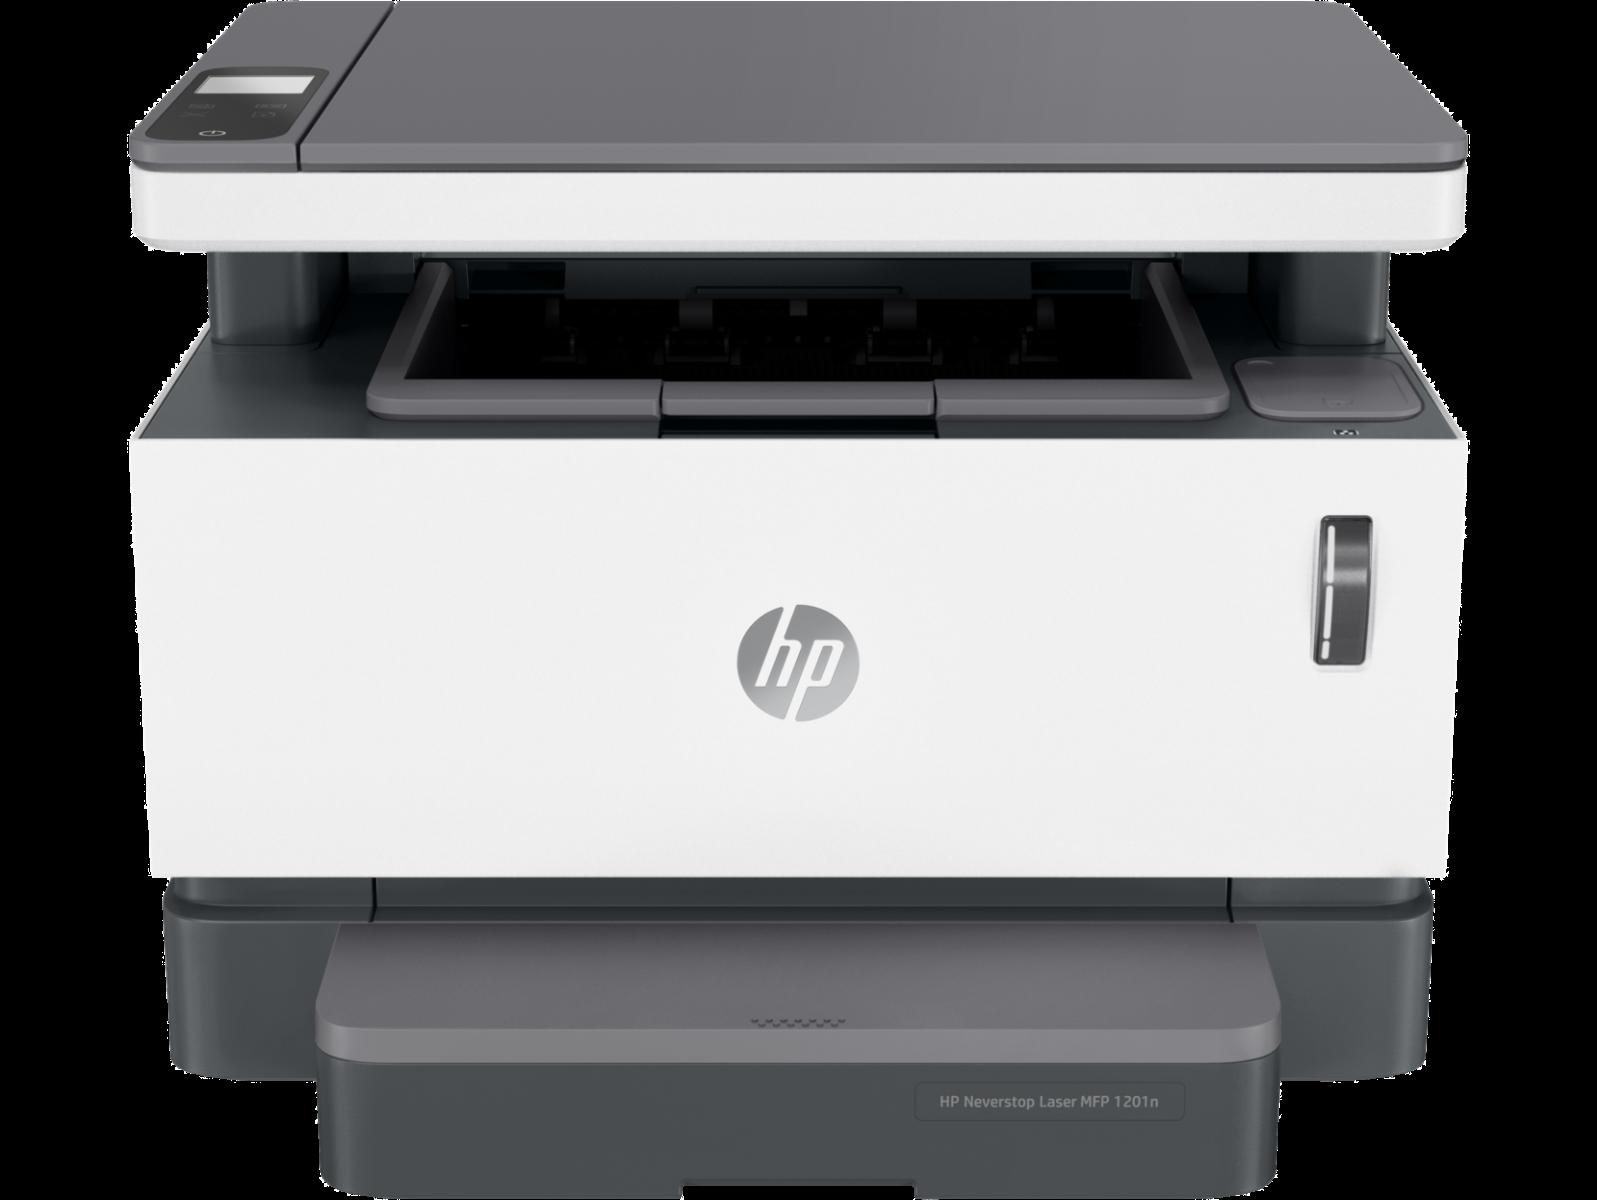 Impressora Laser HP Neverstop MFP 1201n All-In-One